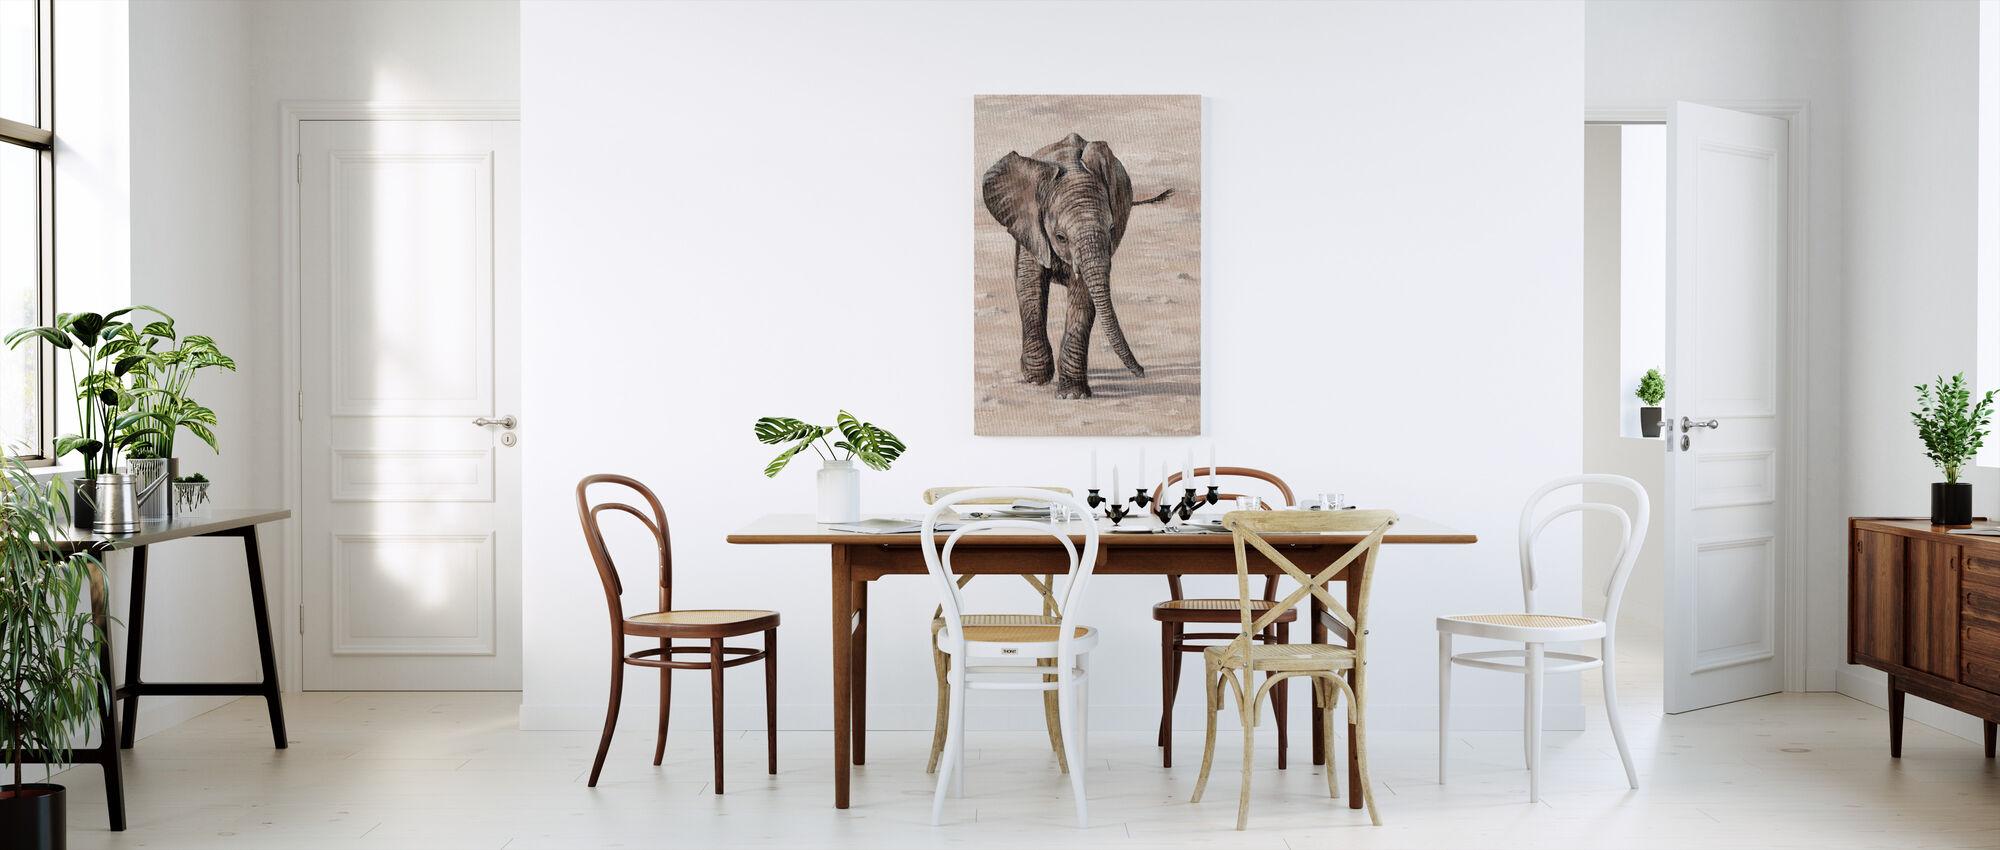 African Elephant Calf - Canvas print - Kitchen